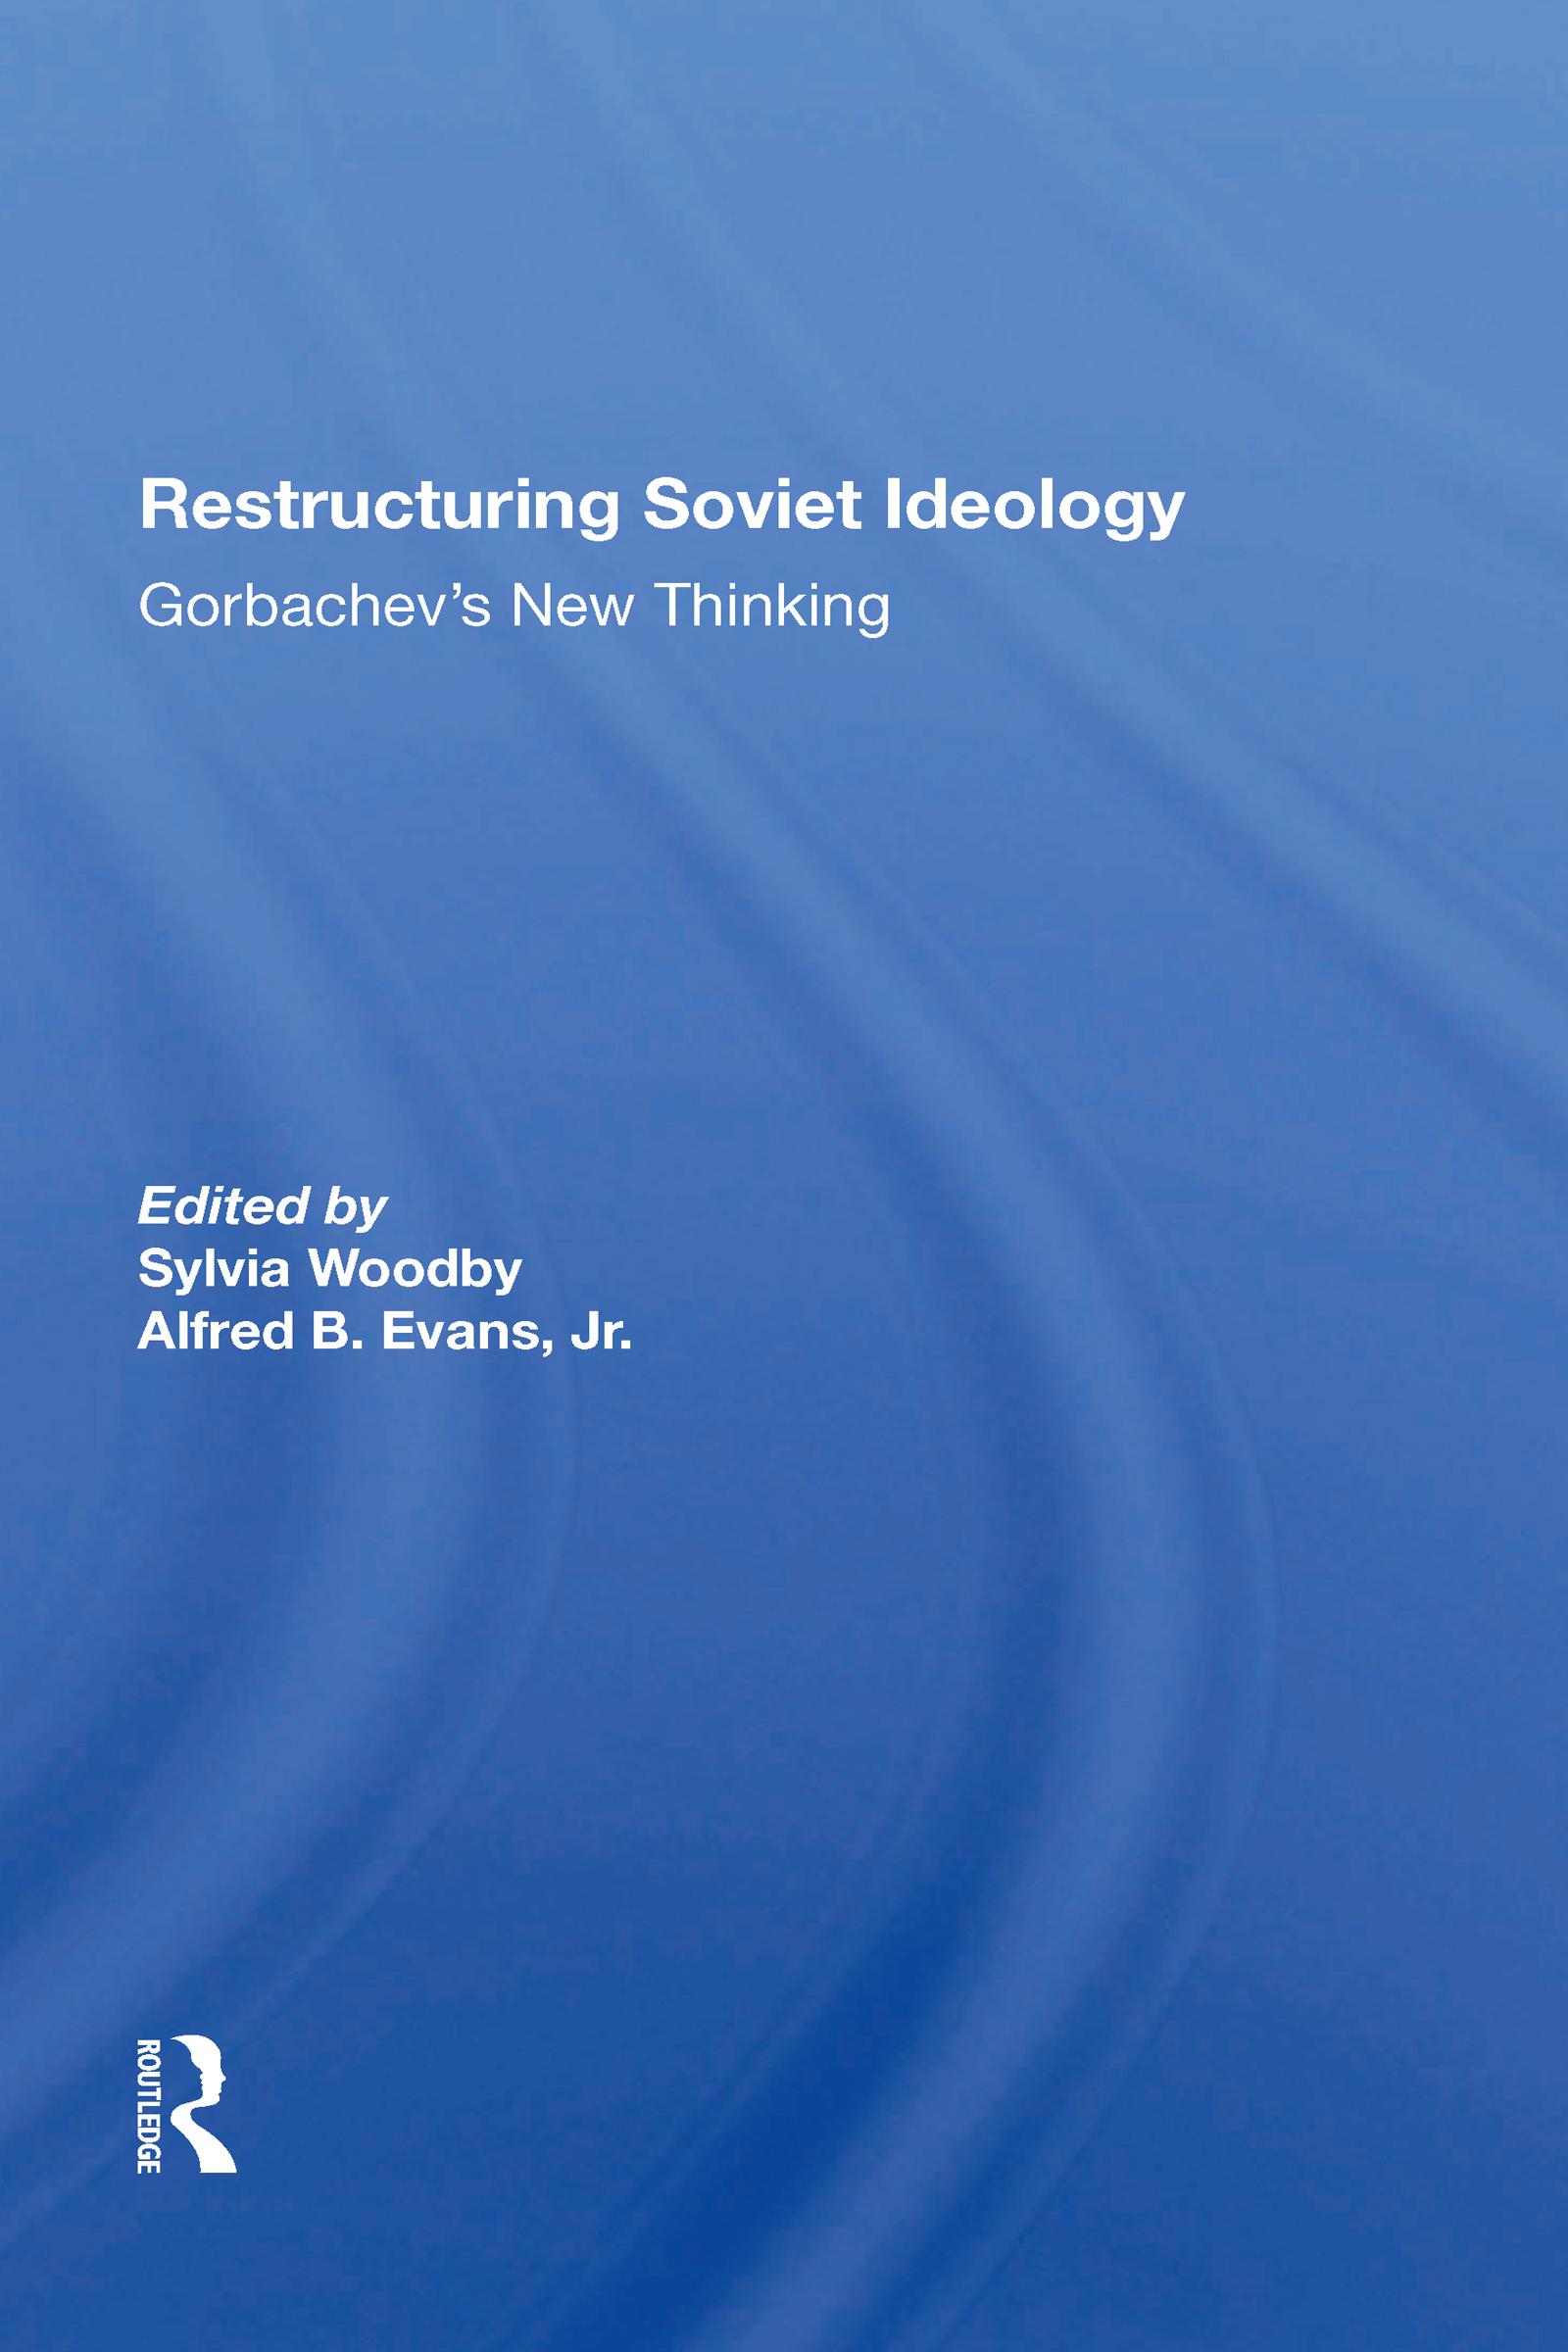 Restructuring Soviet Ideology